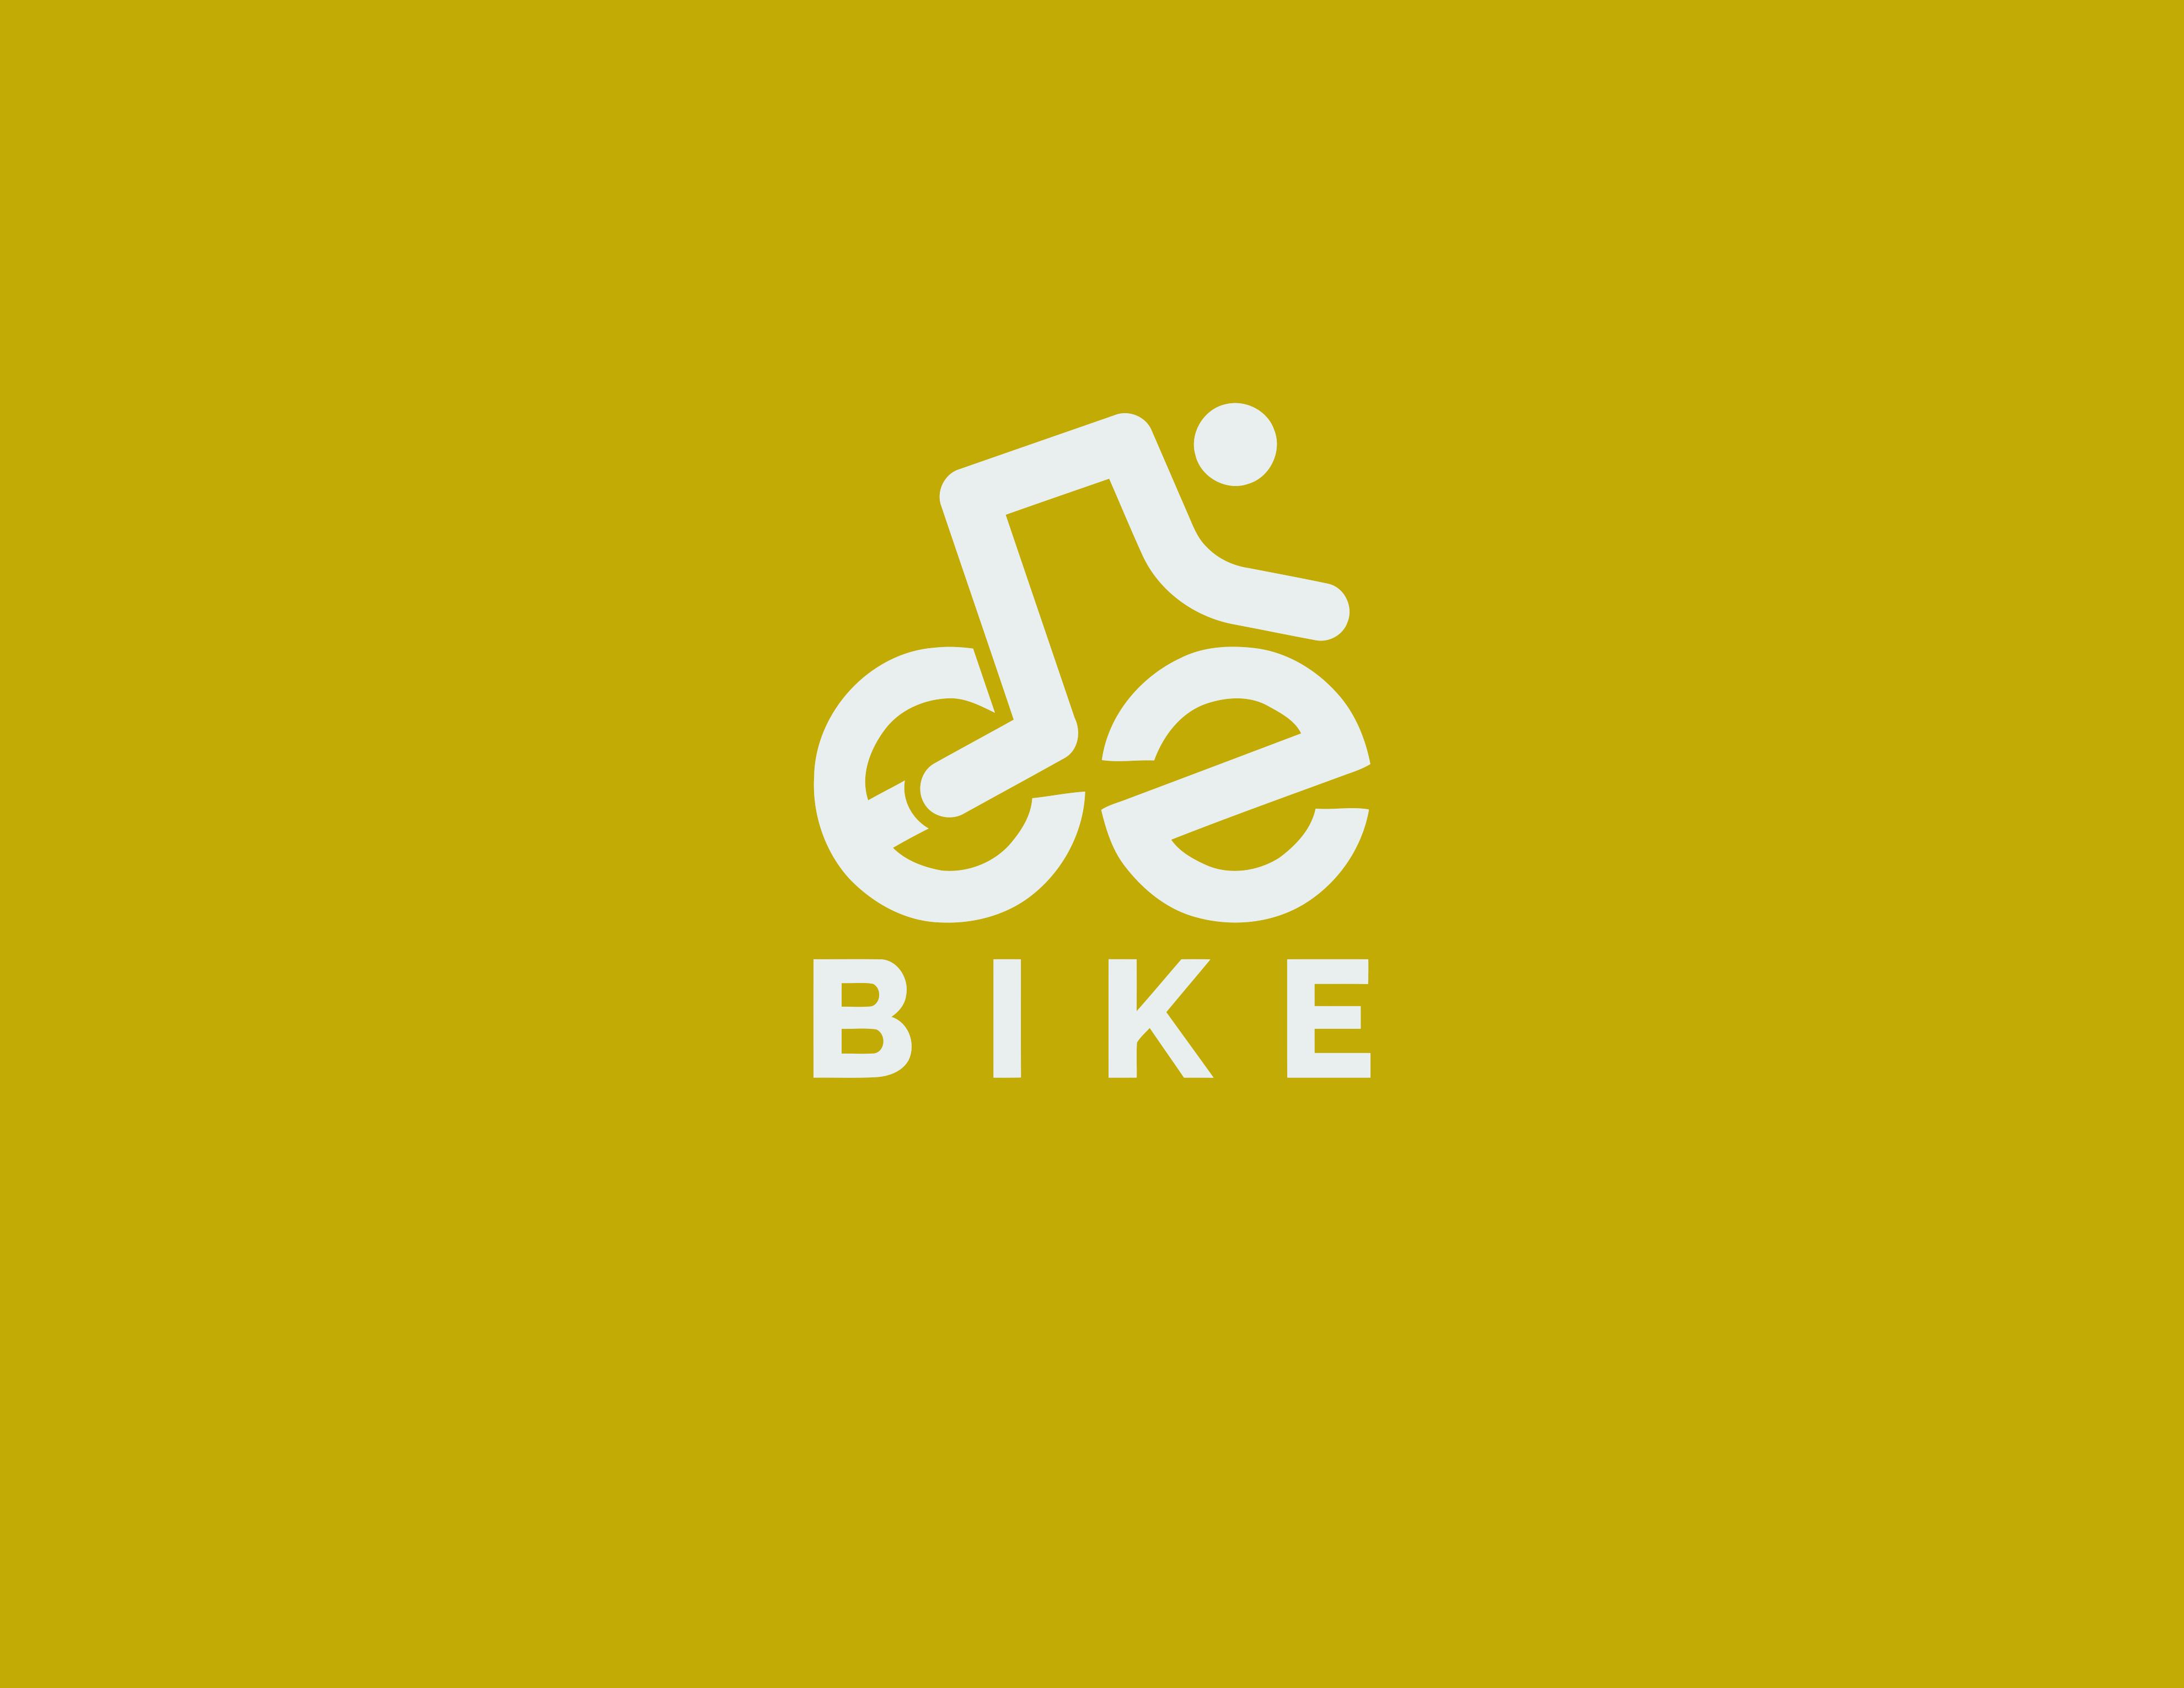 design professional versatile and minimalist business logo